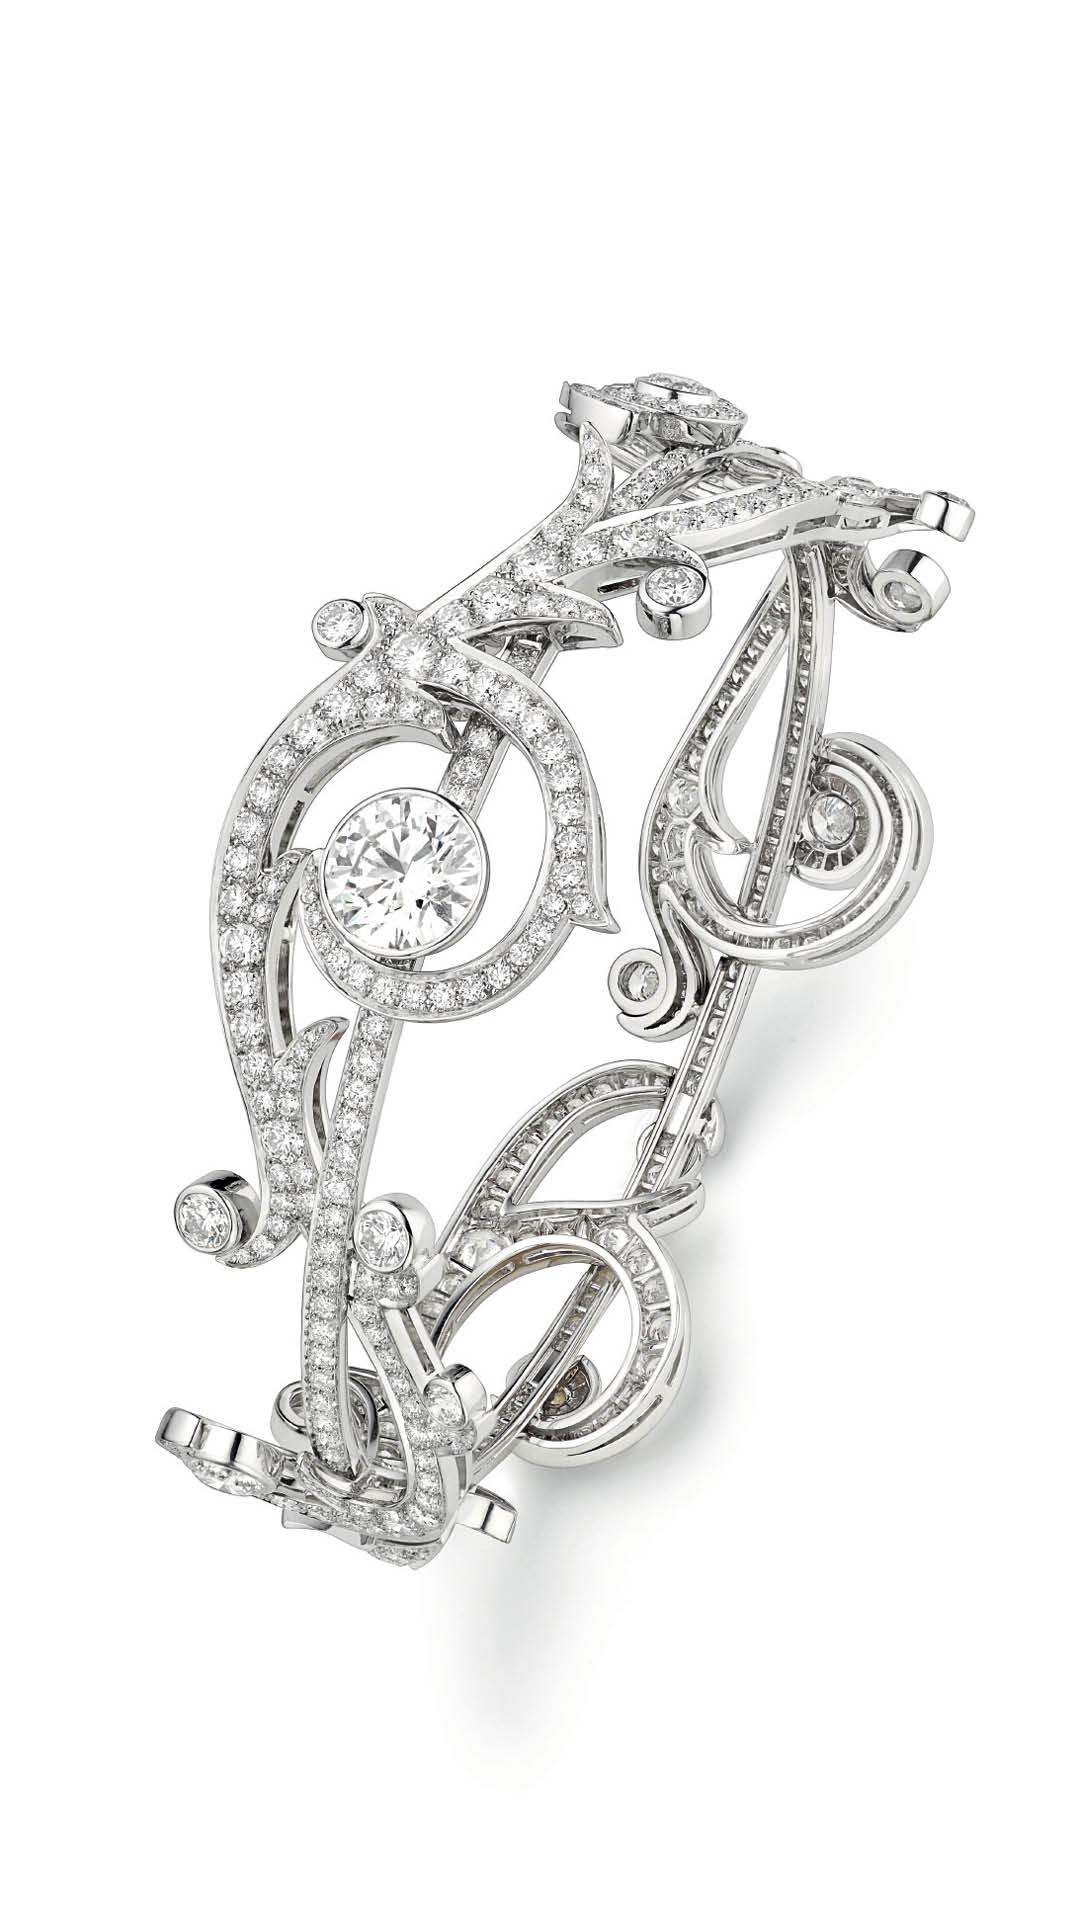 Chaumet-Valses-Bracelet